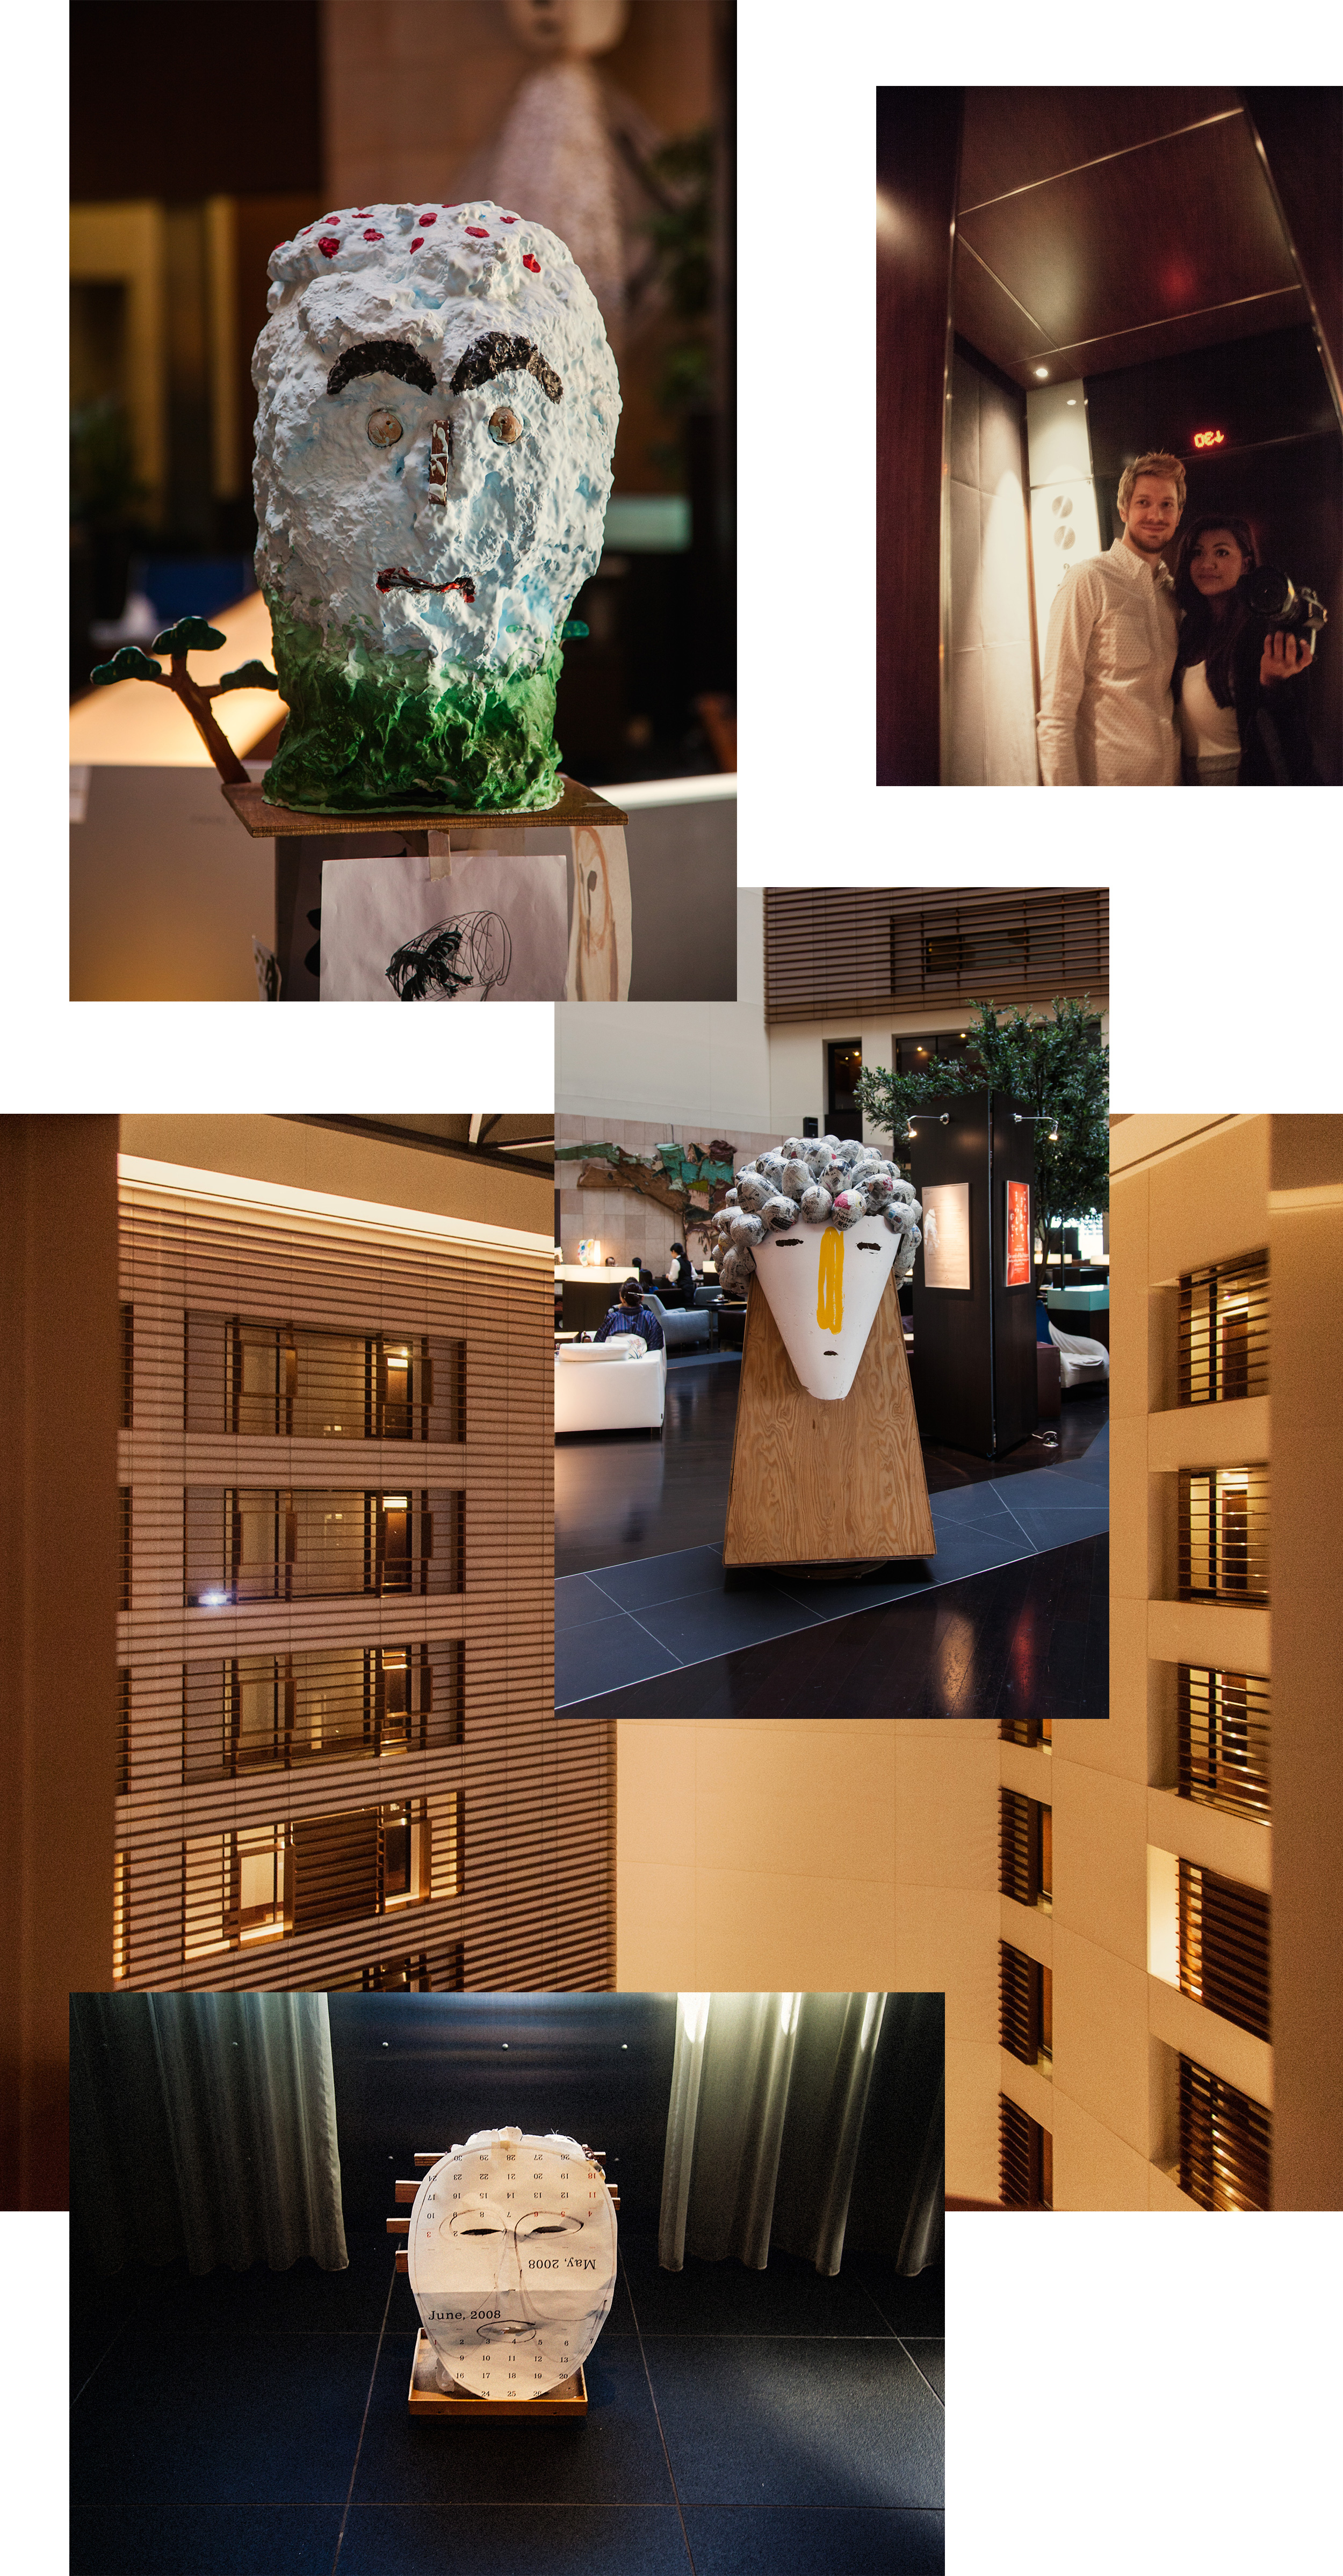 Park Hotel Tokyo - Travel Blog Post